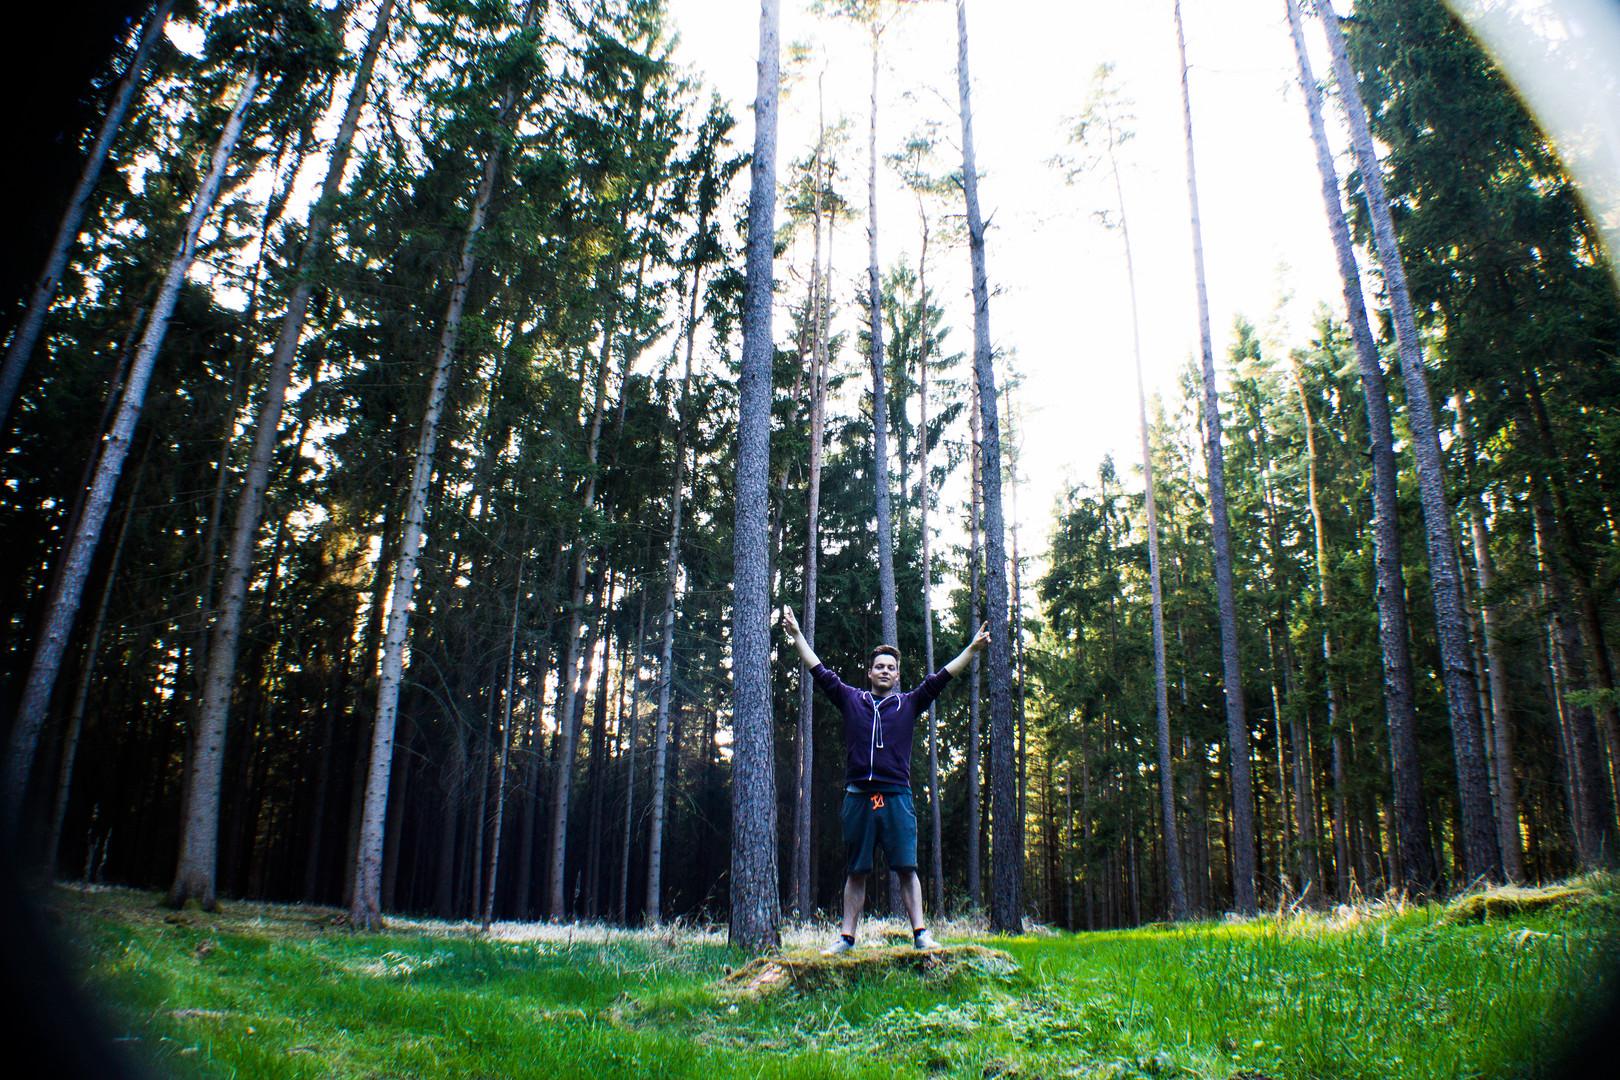 ..iwo im Wald